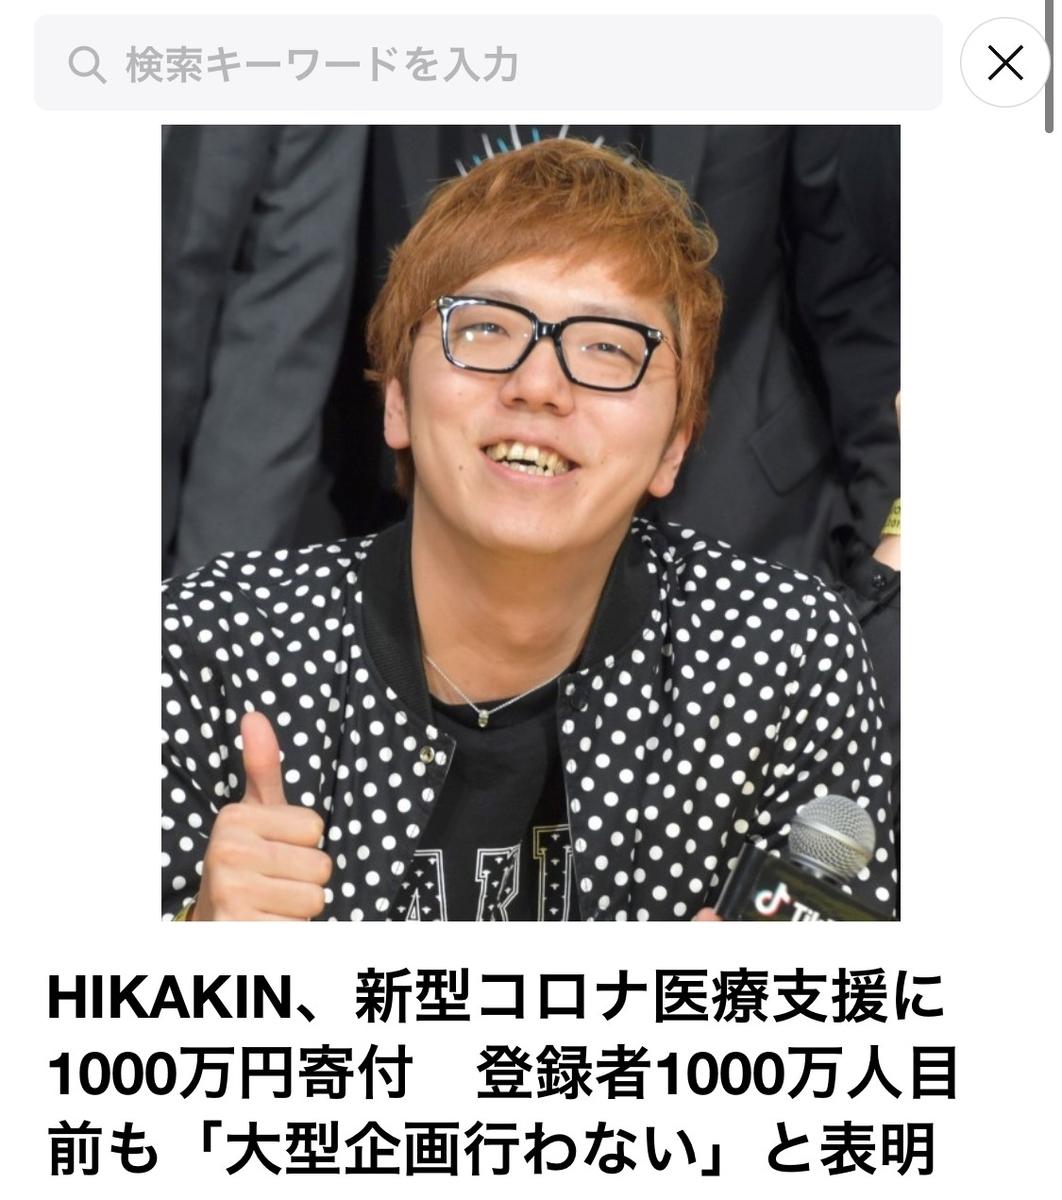 f:id:gk-murai33-gk:20210826100855j:plain